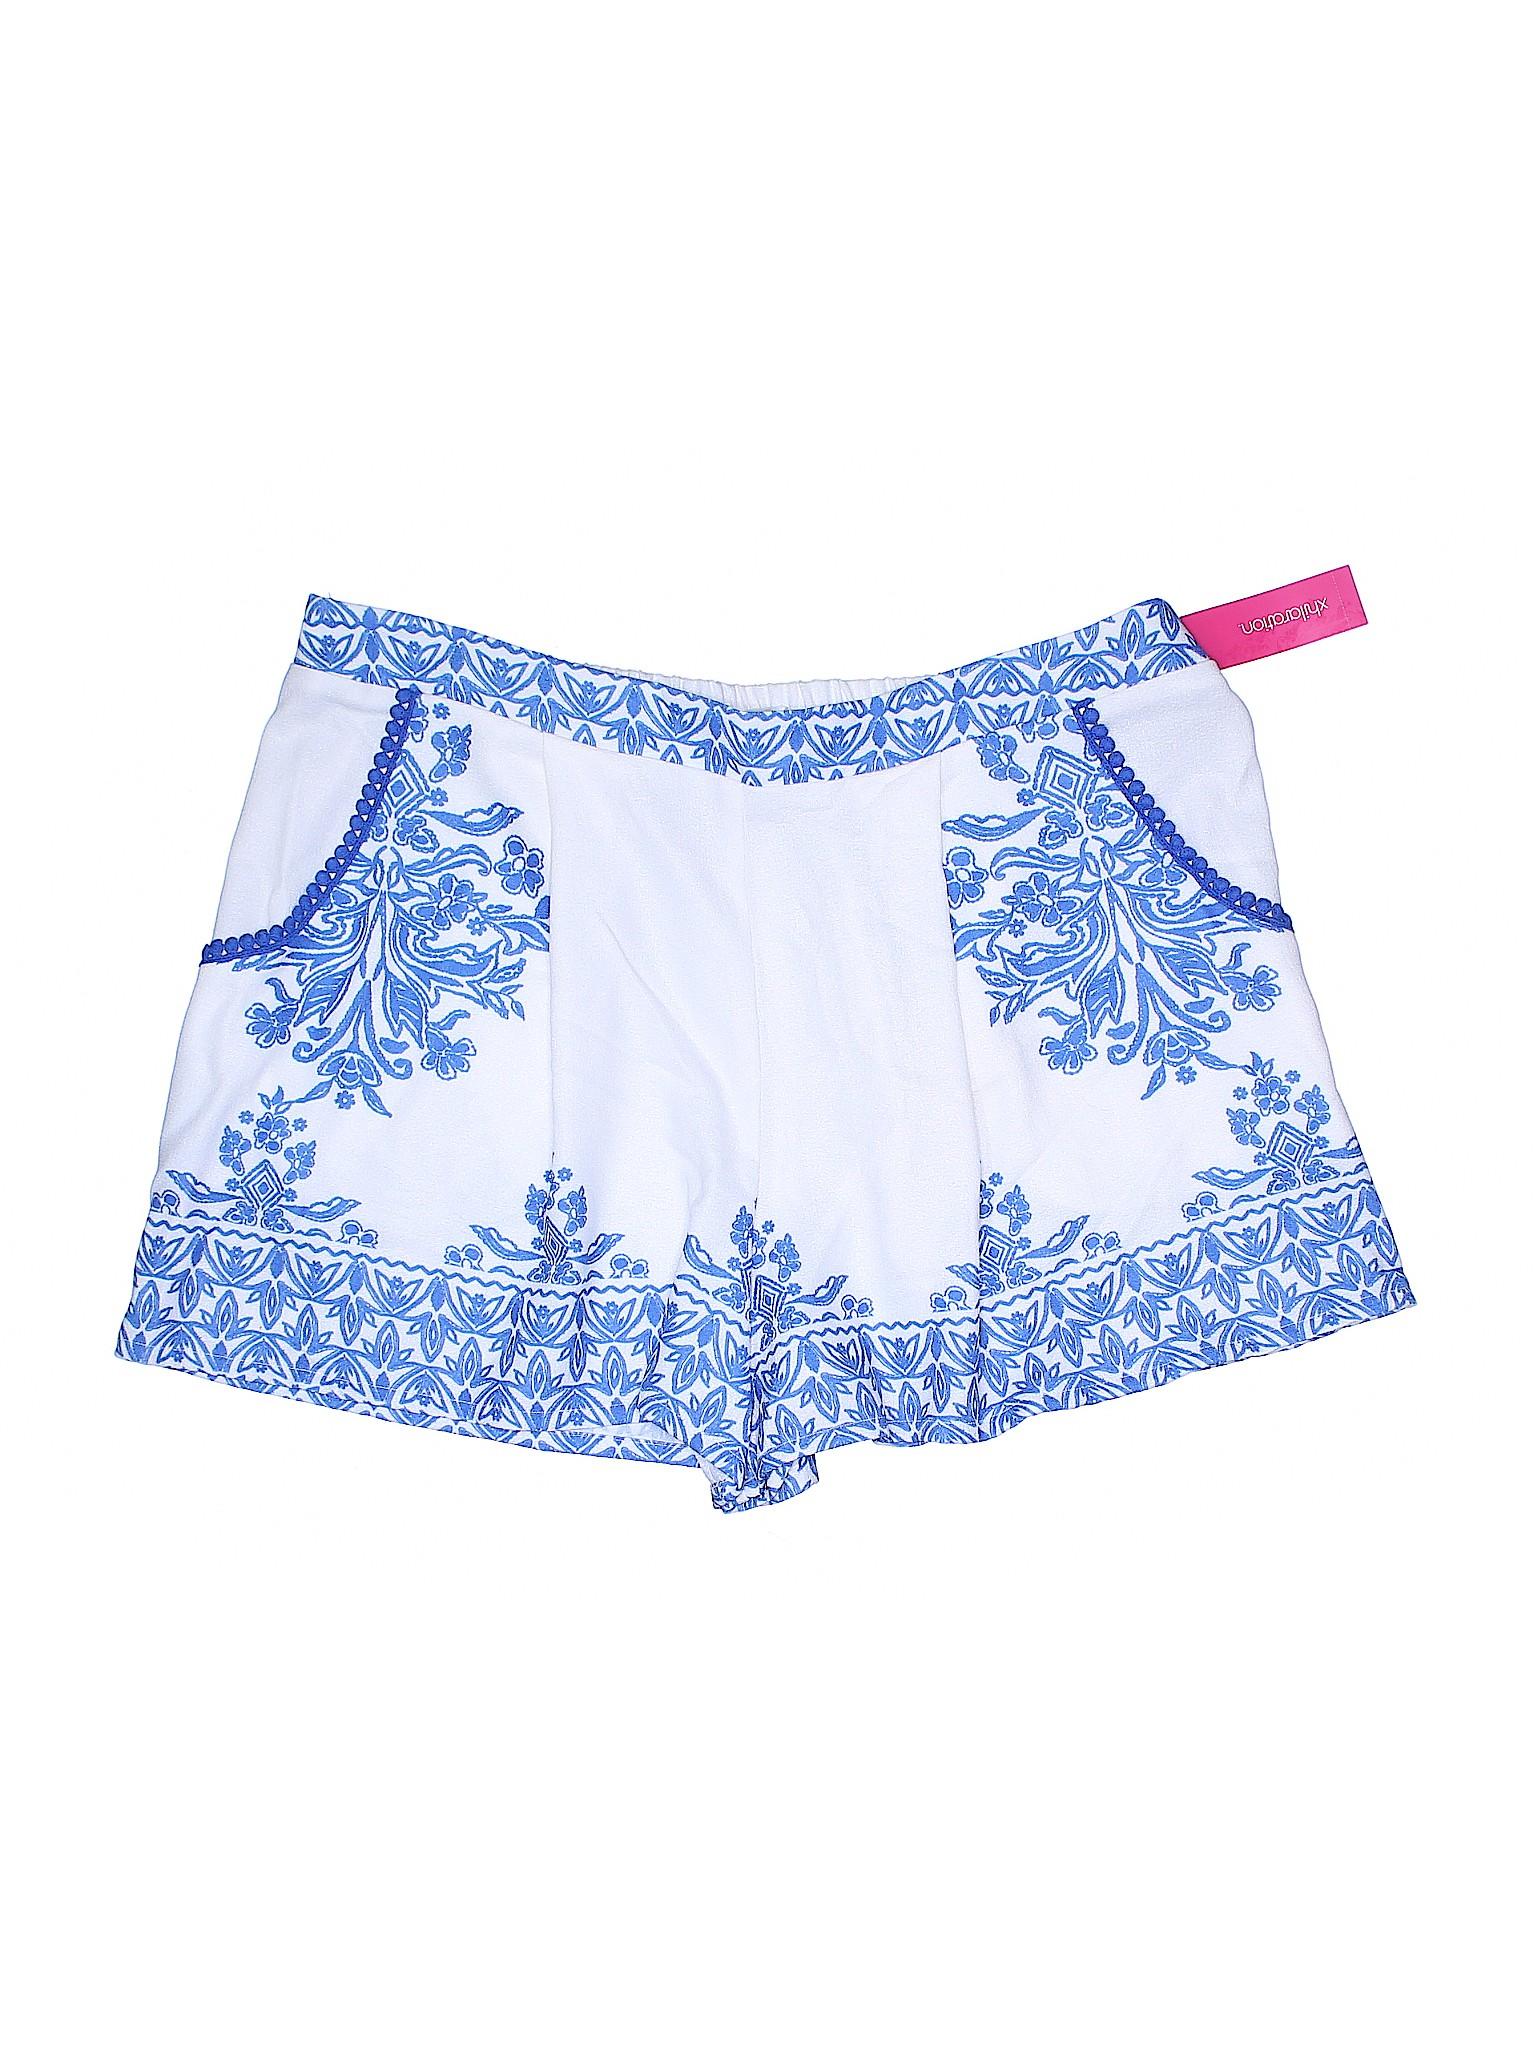 Boutique Xhilaration Shorts Shorts Boutique Boutique Xhilaration U4wdwq6Yx